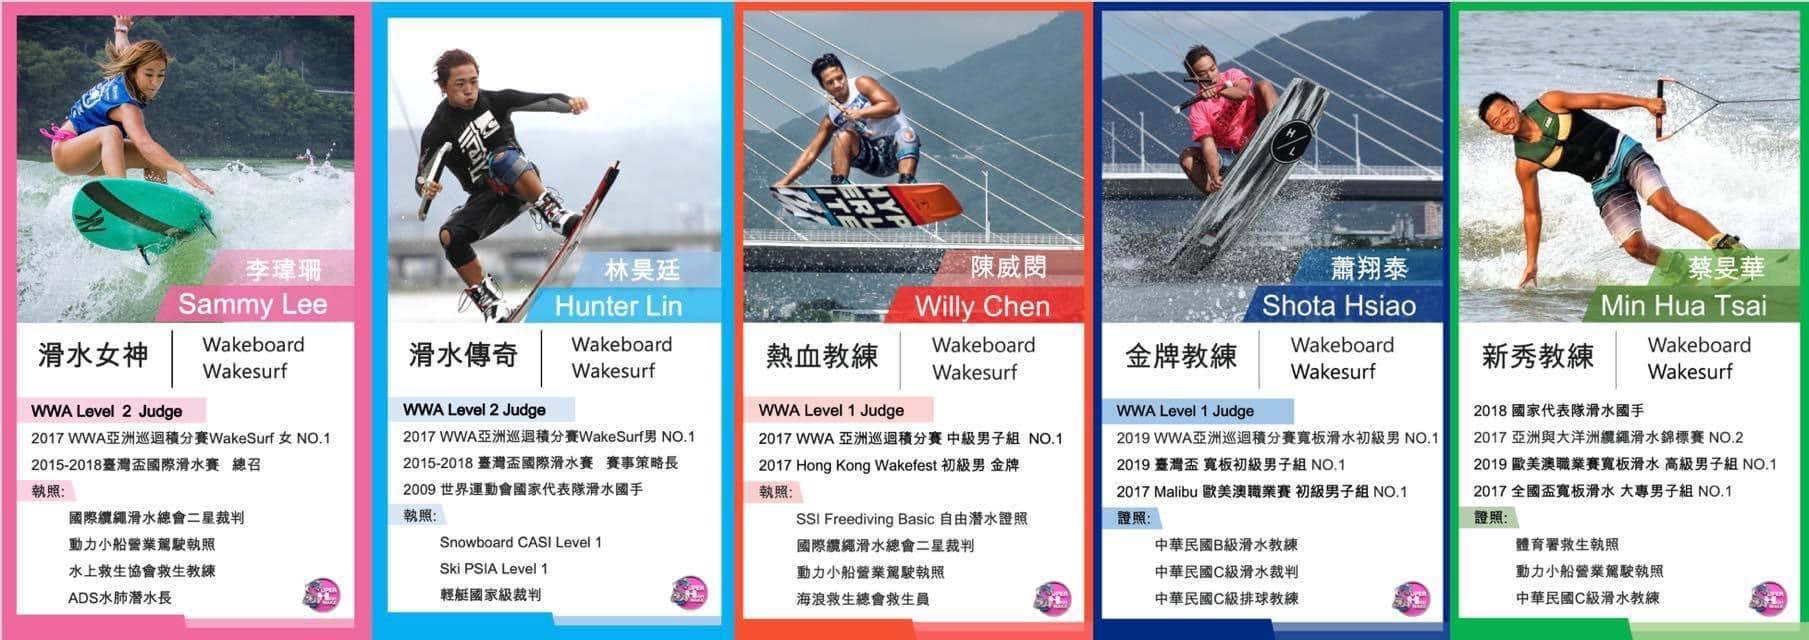 #JobOffer #WakeBoard #NorthernTaiwan #Taipei